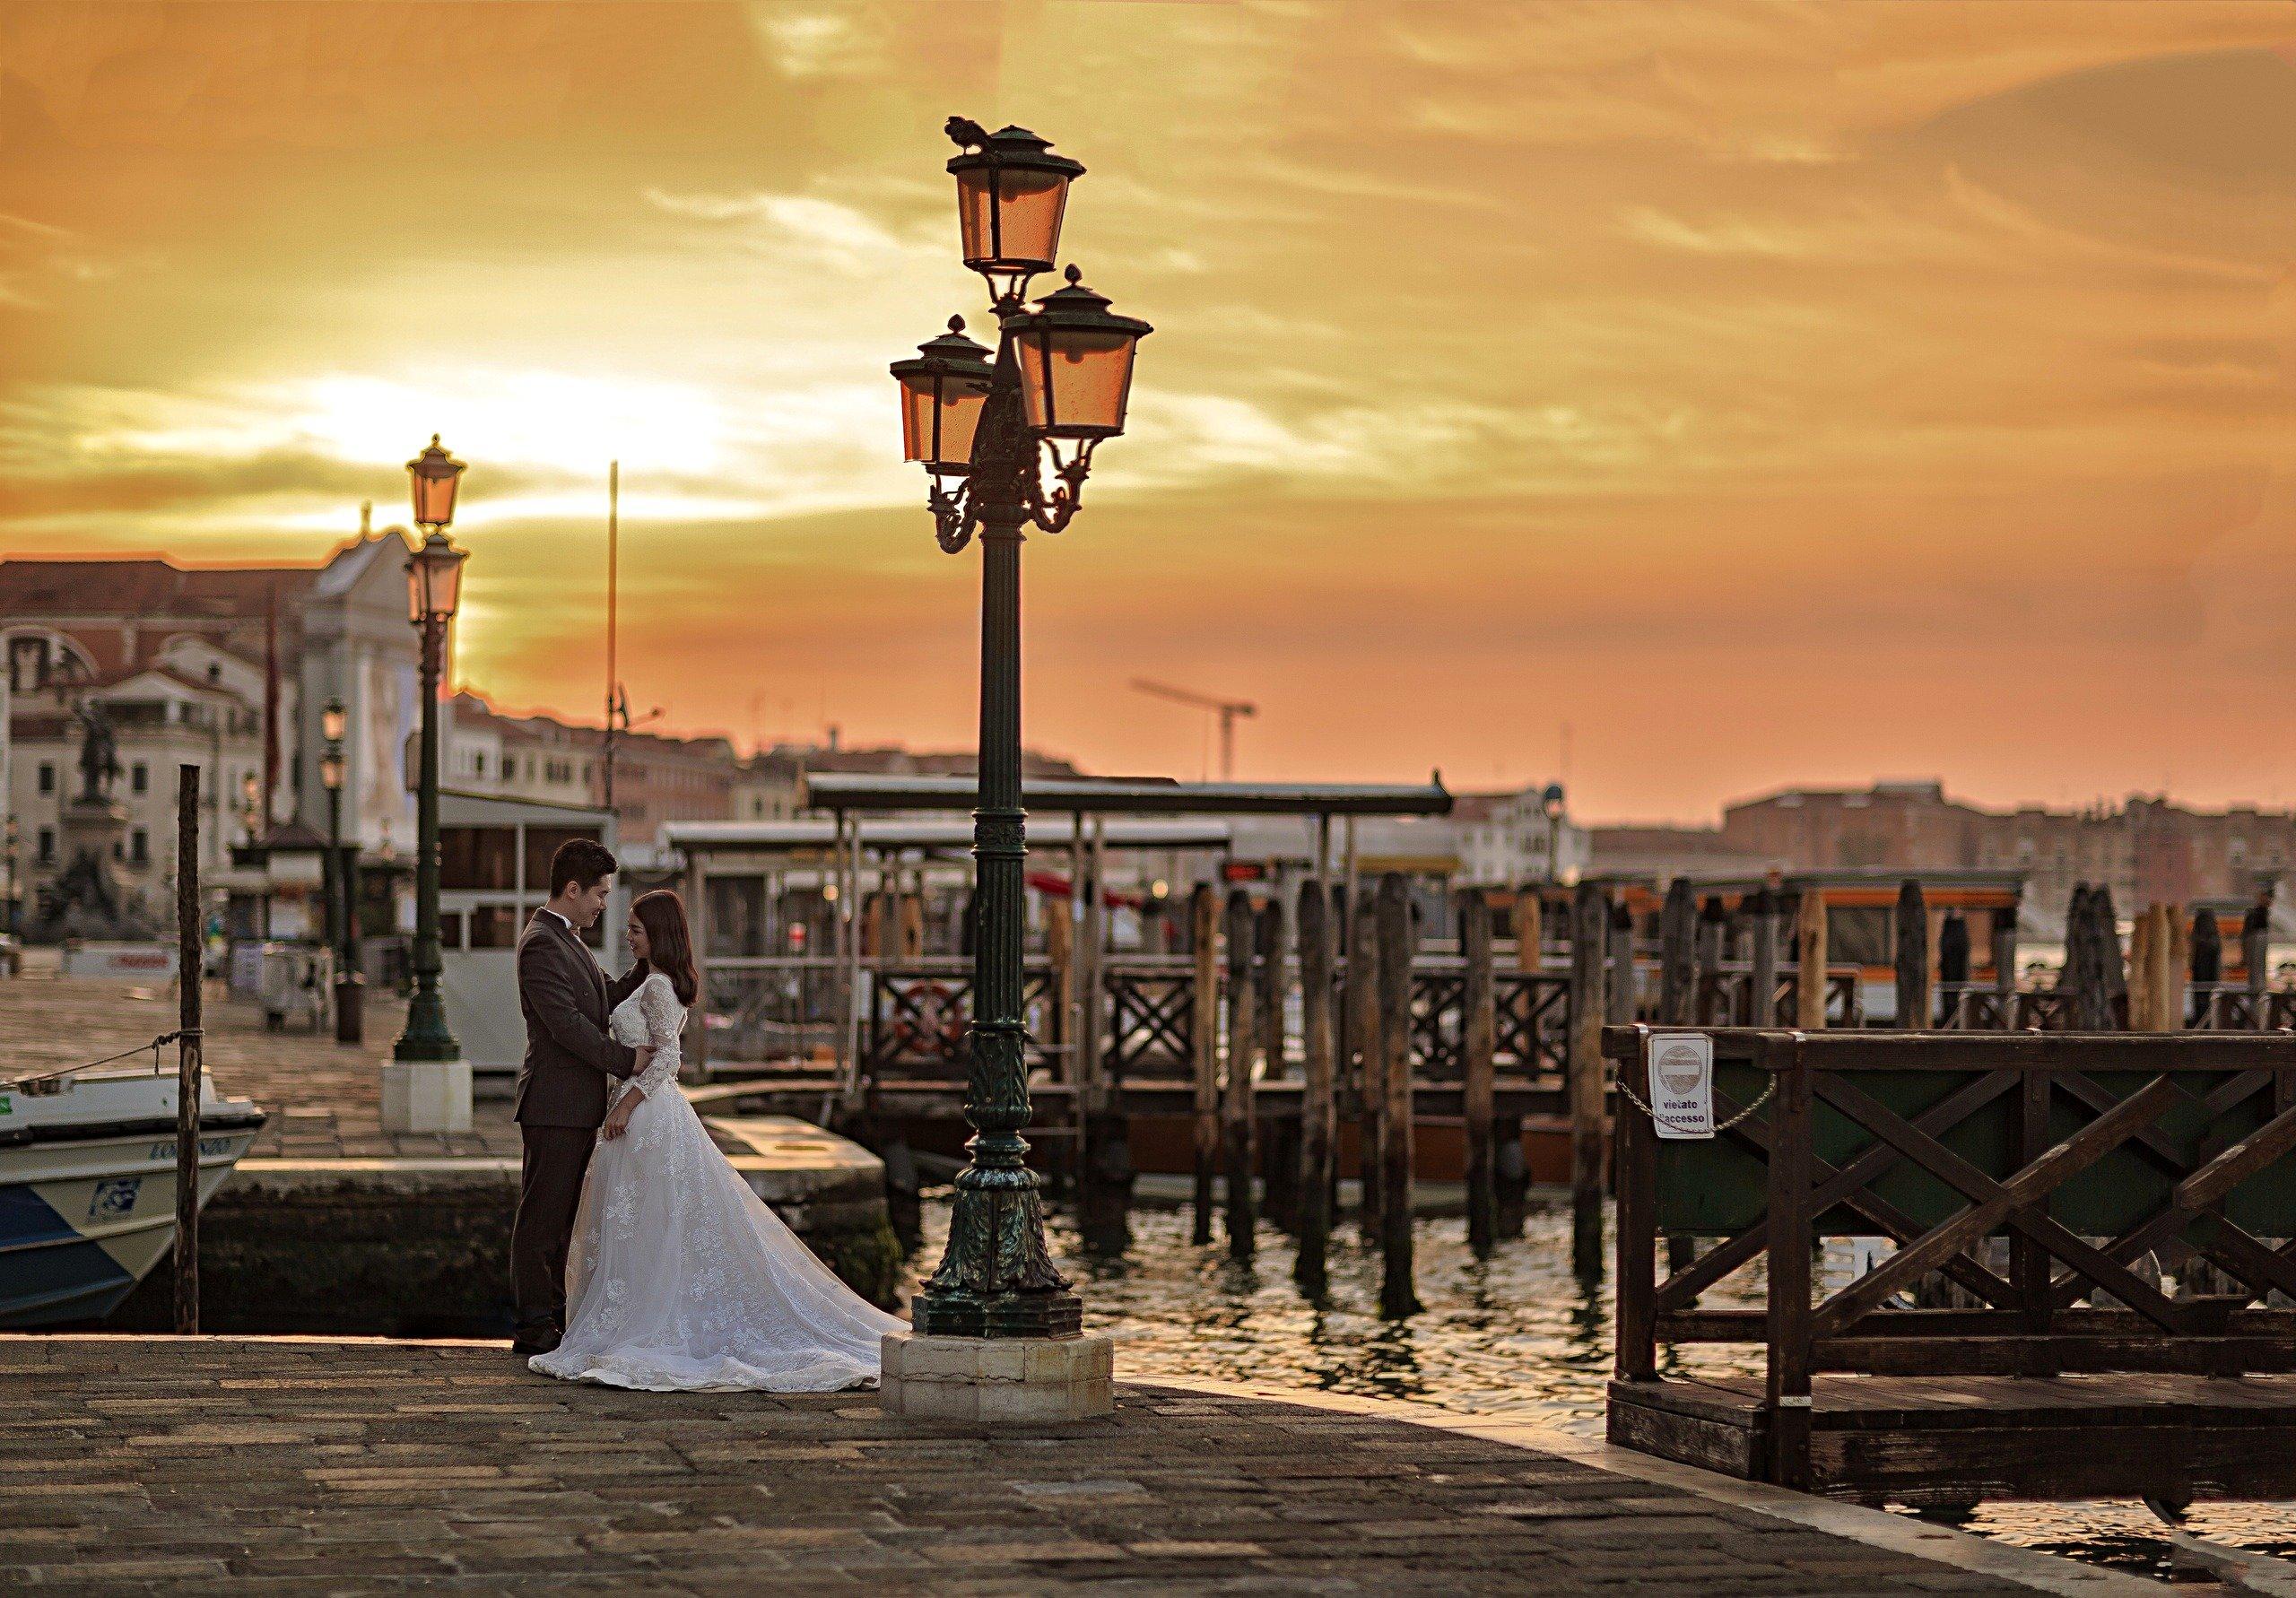 венеция, сан марко, площадь, закат, рассвет, свадьба, Екатерина